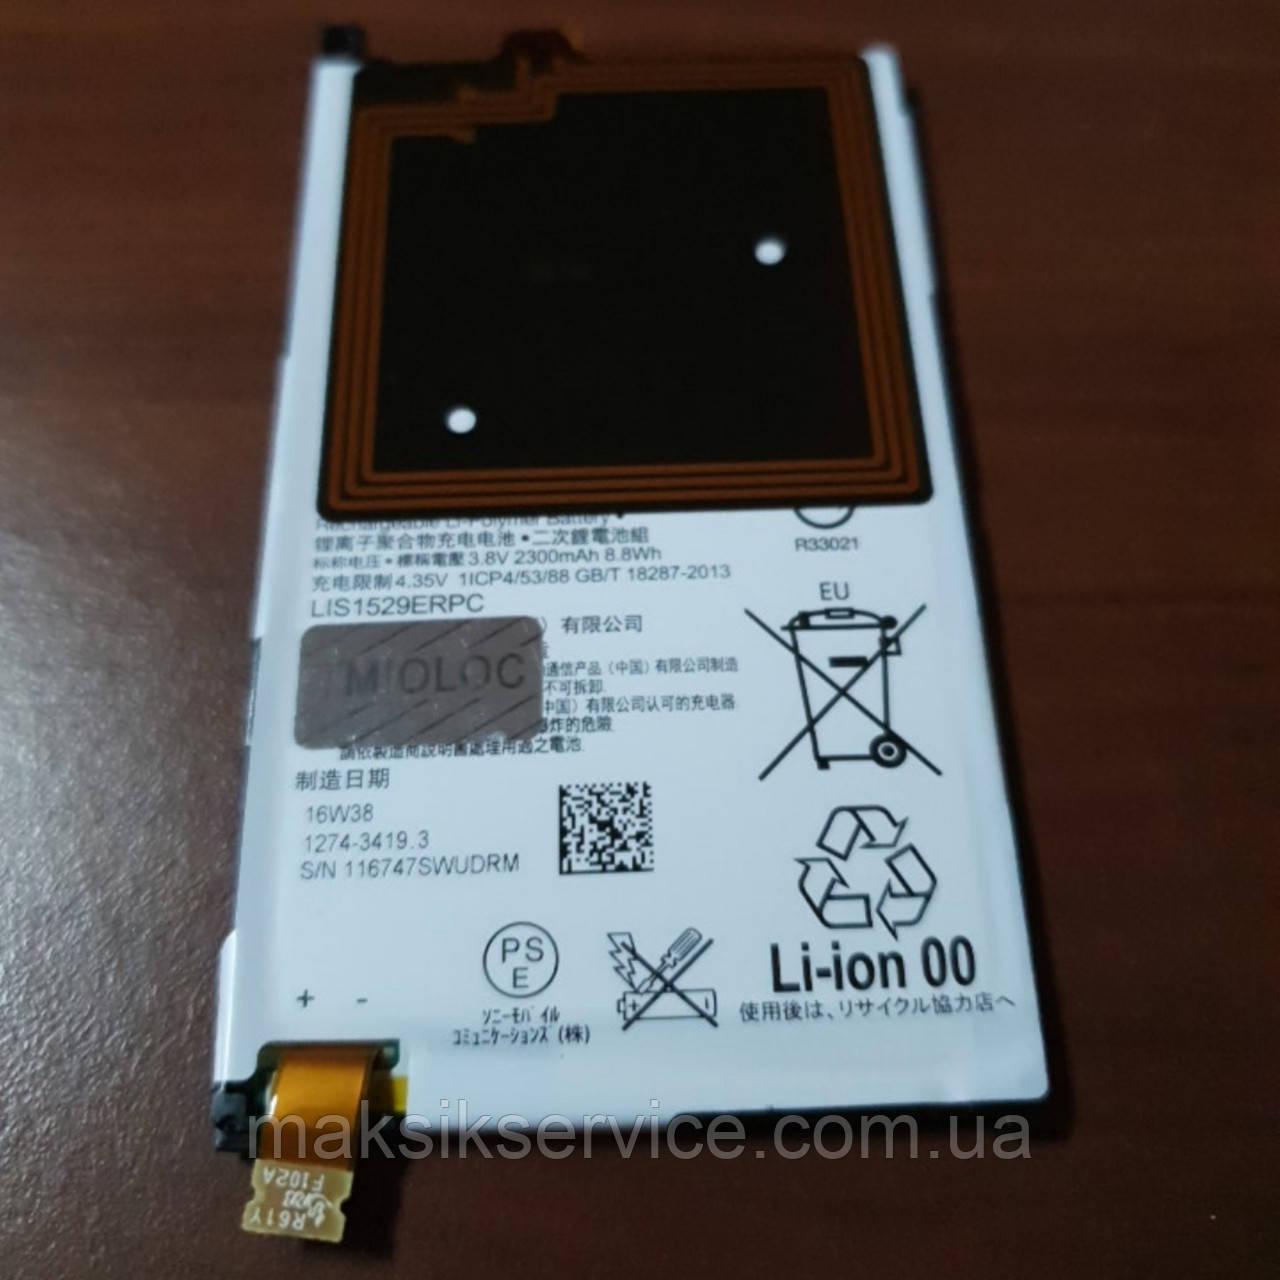 Аккумулятор для  Sony LIS1529ERPC Xperia Z1 Compact D5503